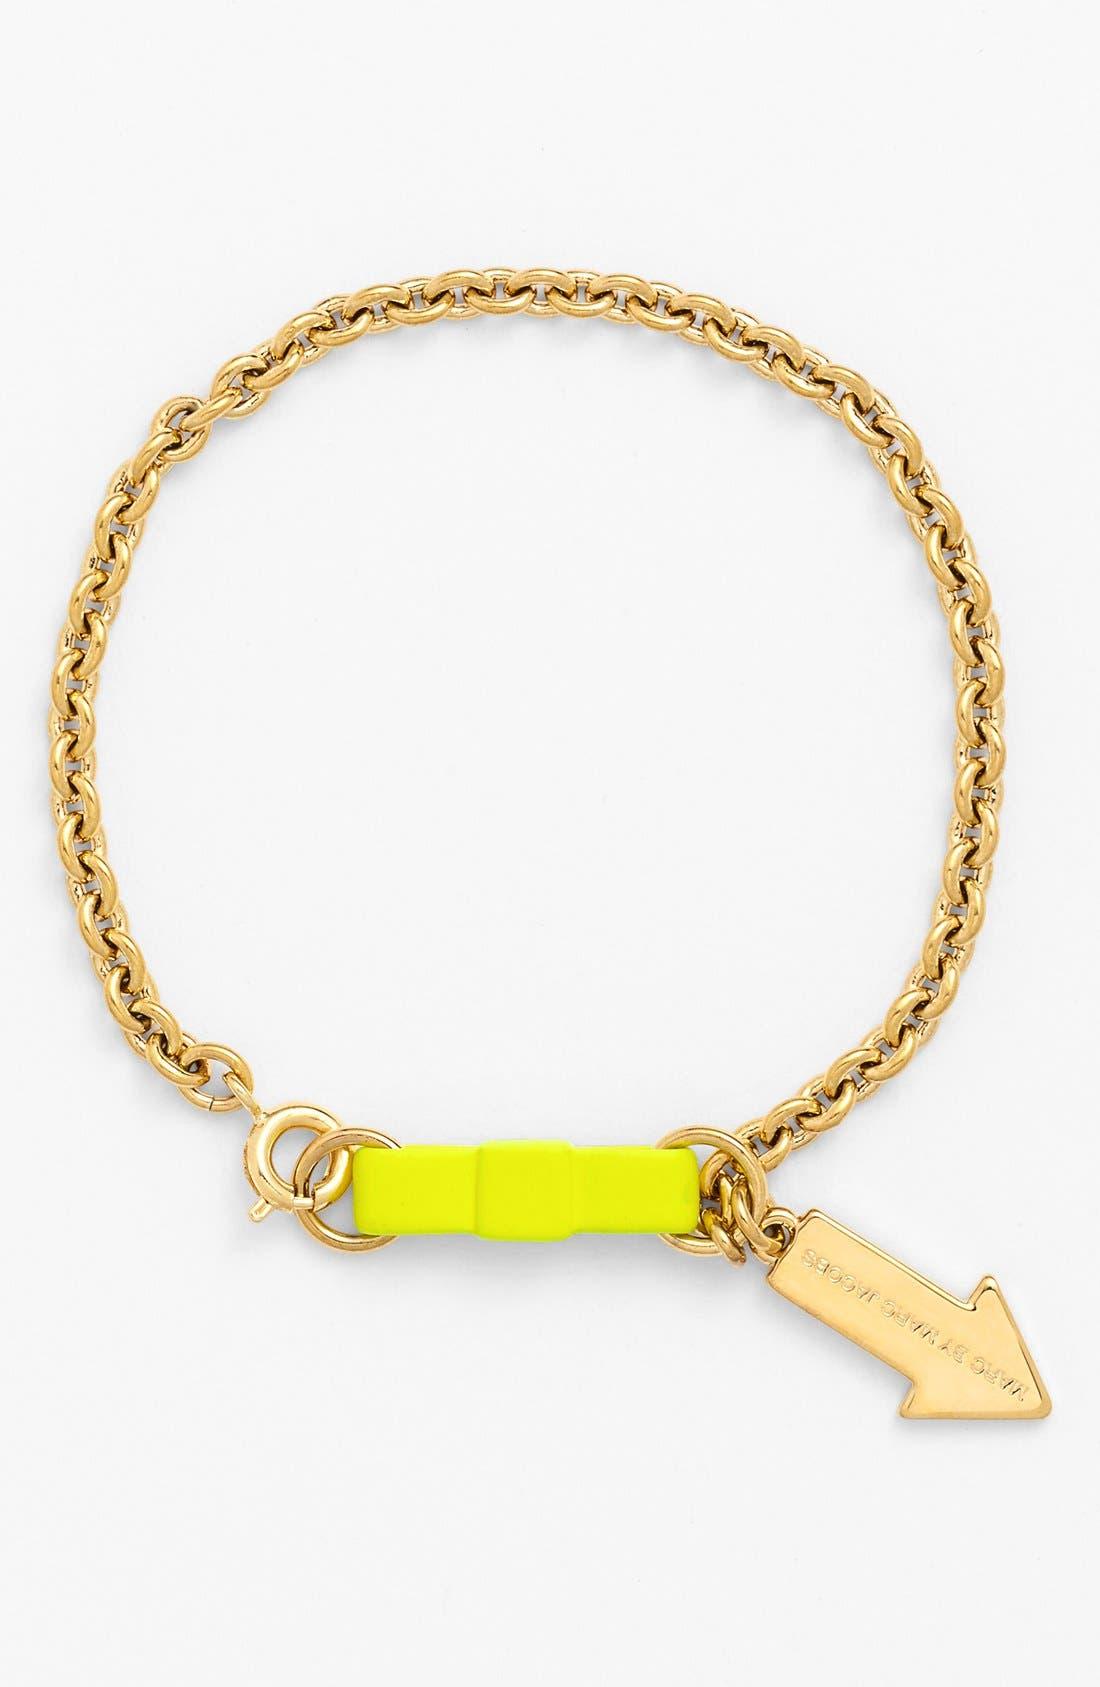 Main Image - MARC BY MARC JACOBS Bow Tie Charm Bracelet